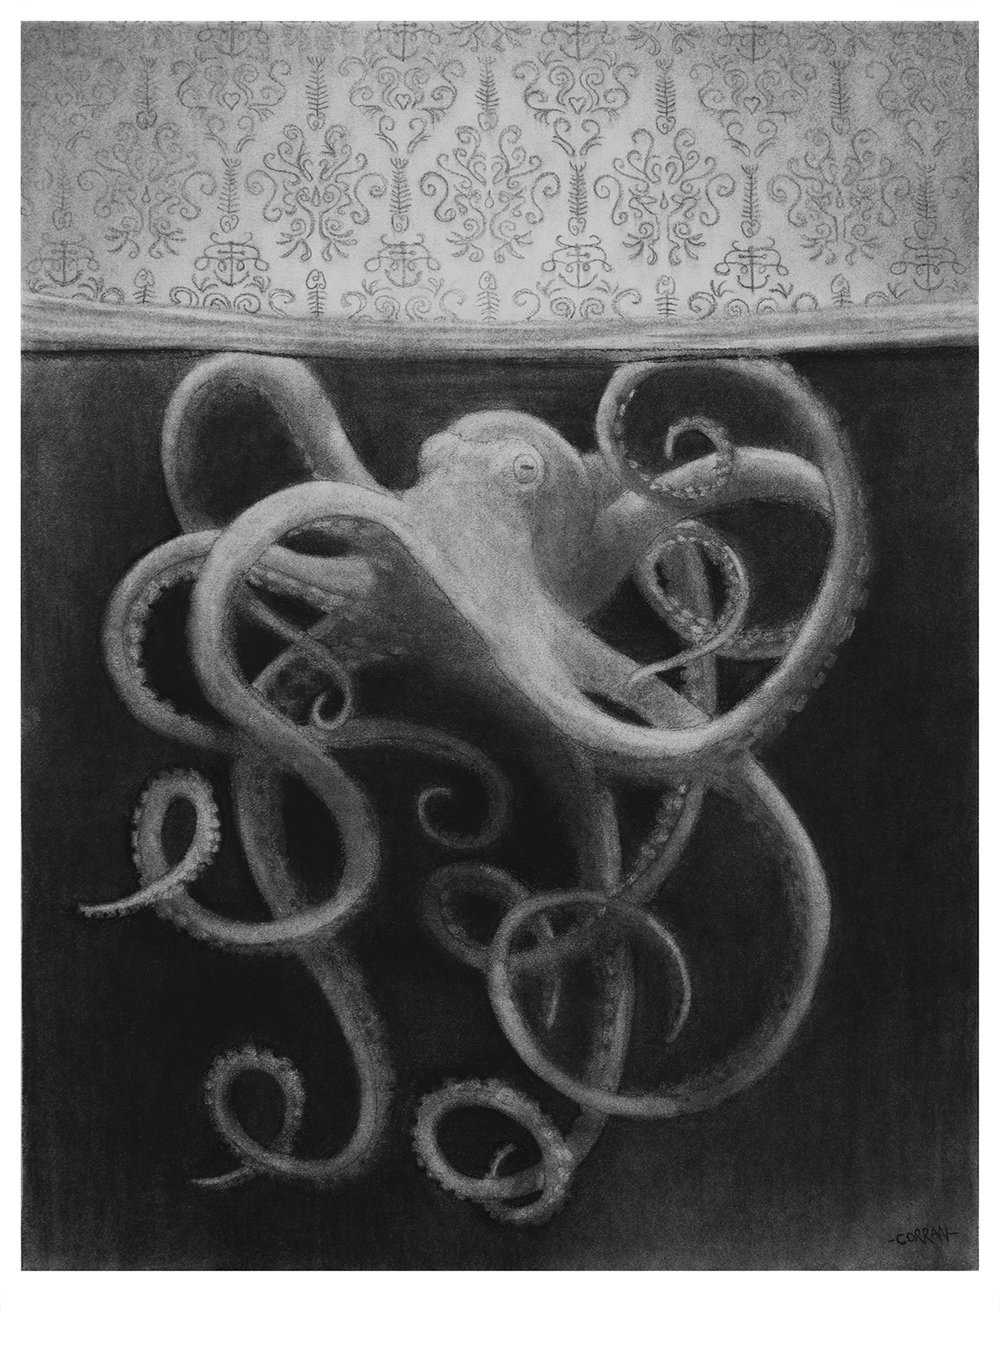 Octopus, 2018